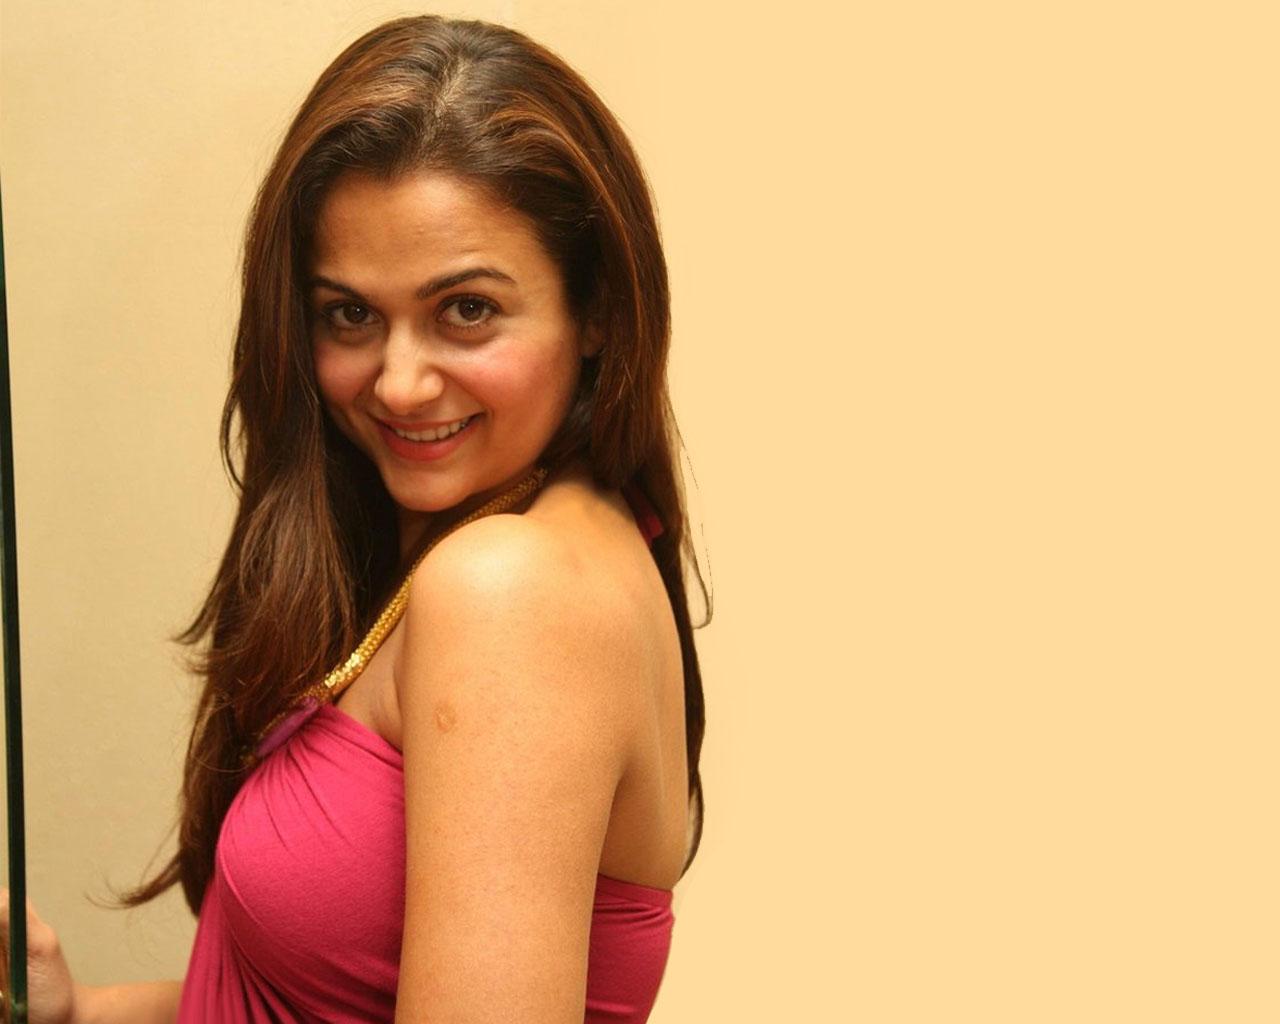 Mersers Hairstyles Bollywood Actress Amrita Arora